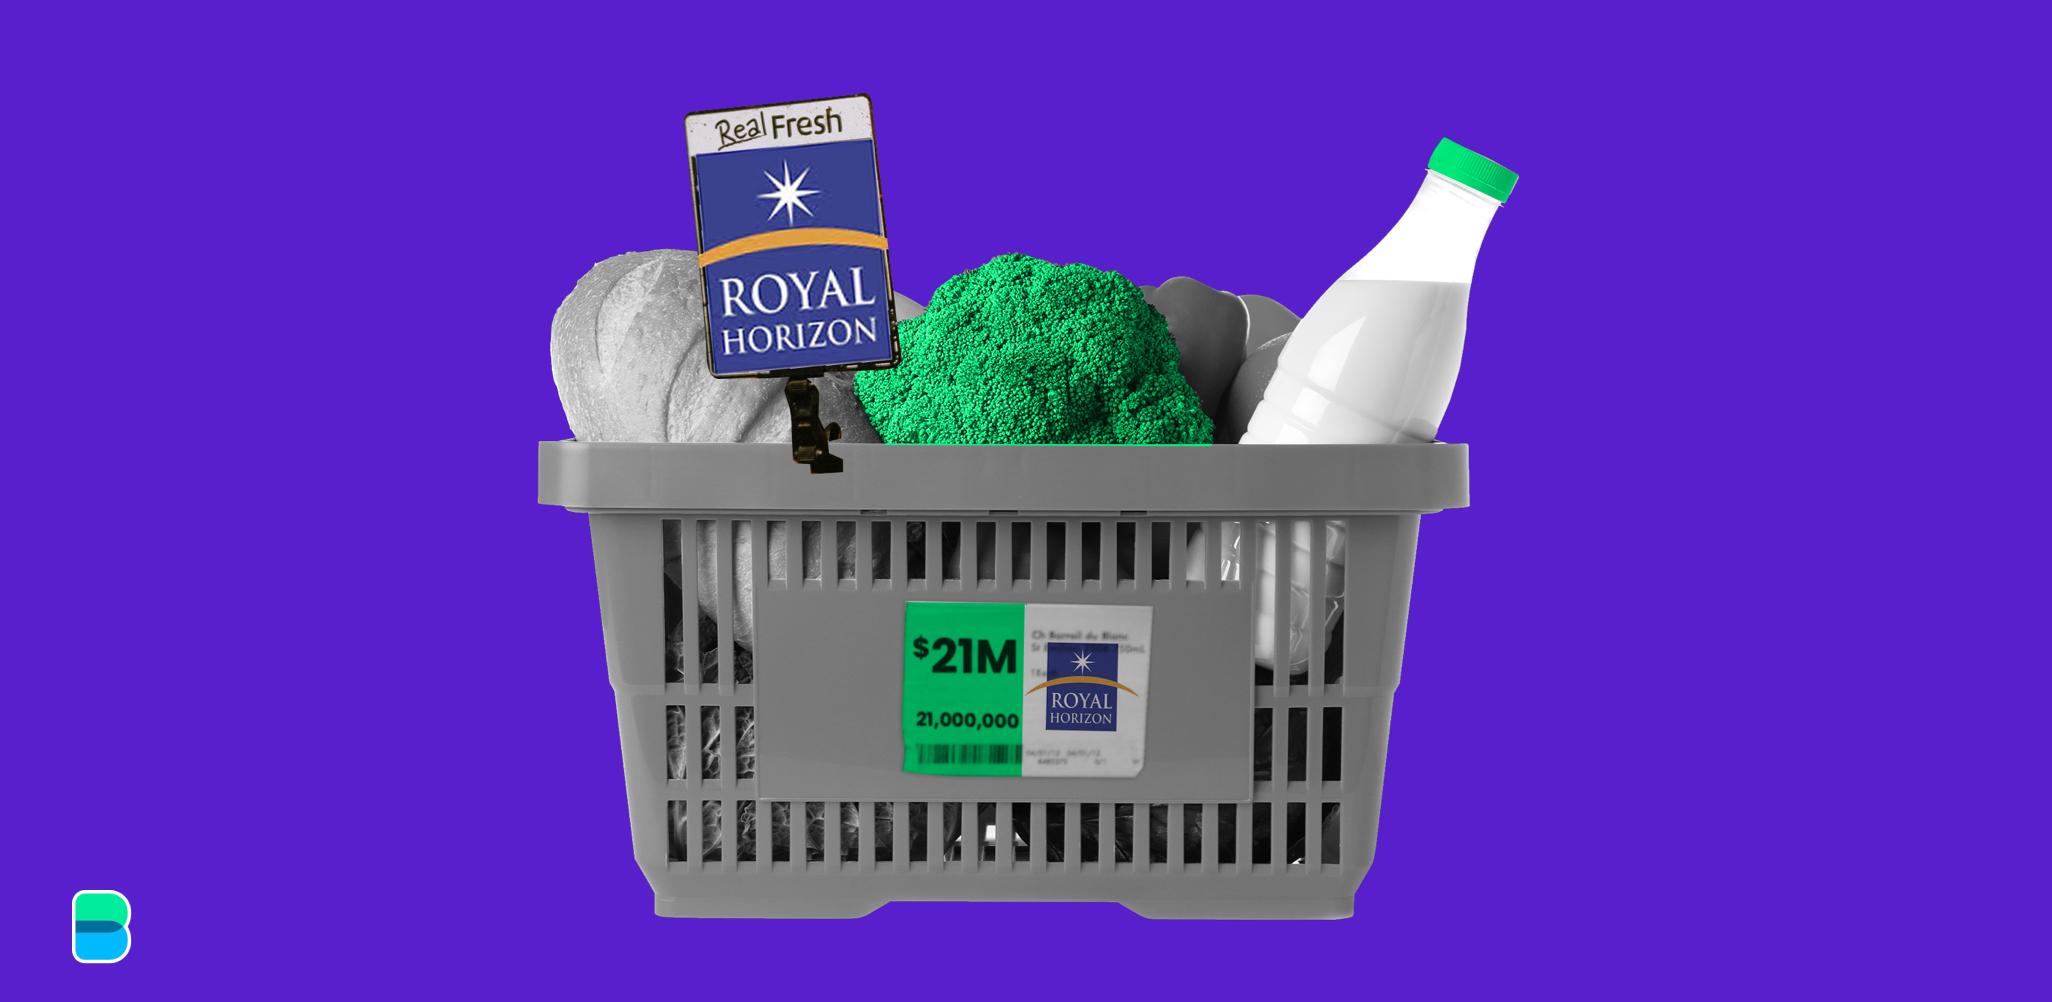 IHC scoops up Royal Horizon majority